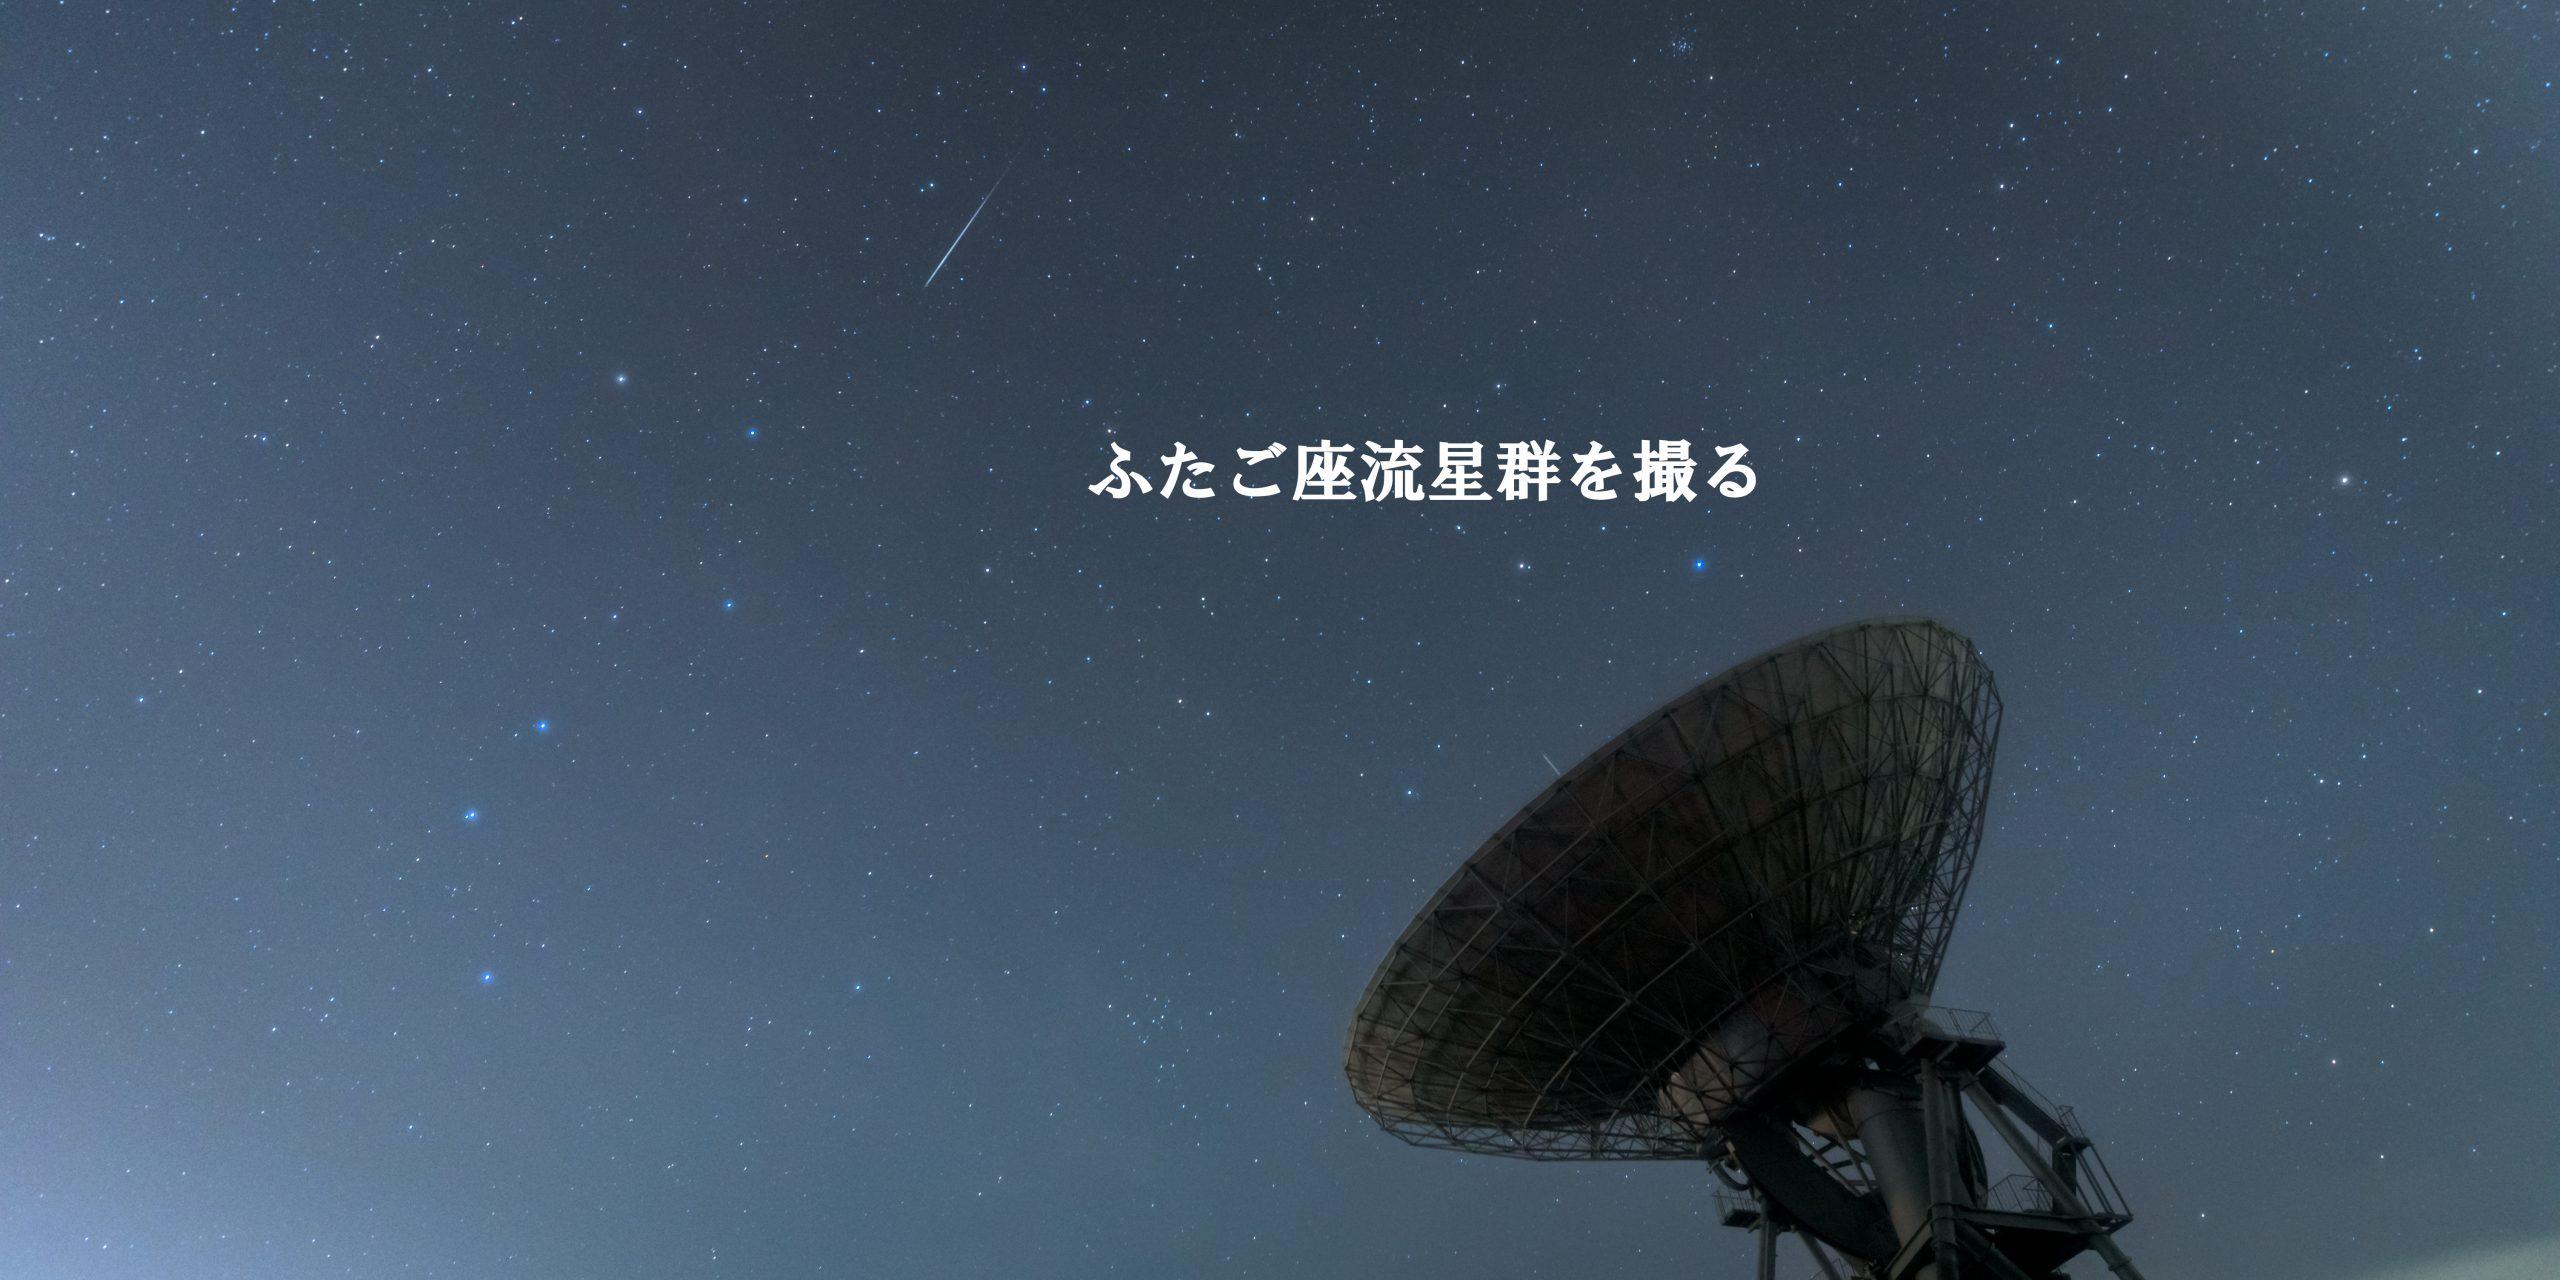 【Wish Upon a Star】ふたご座流星群2020